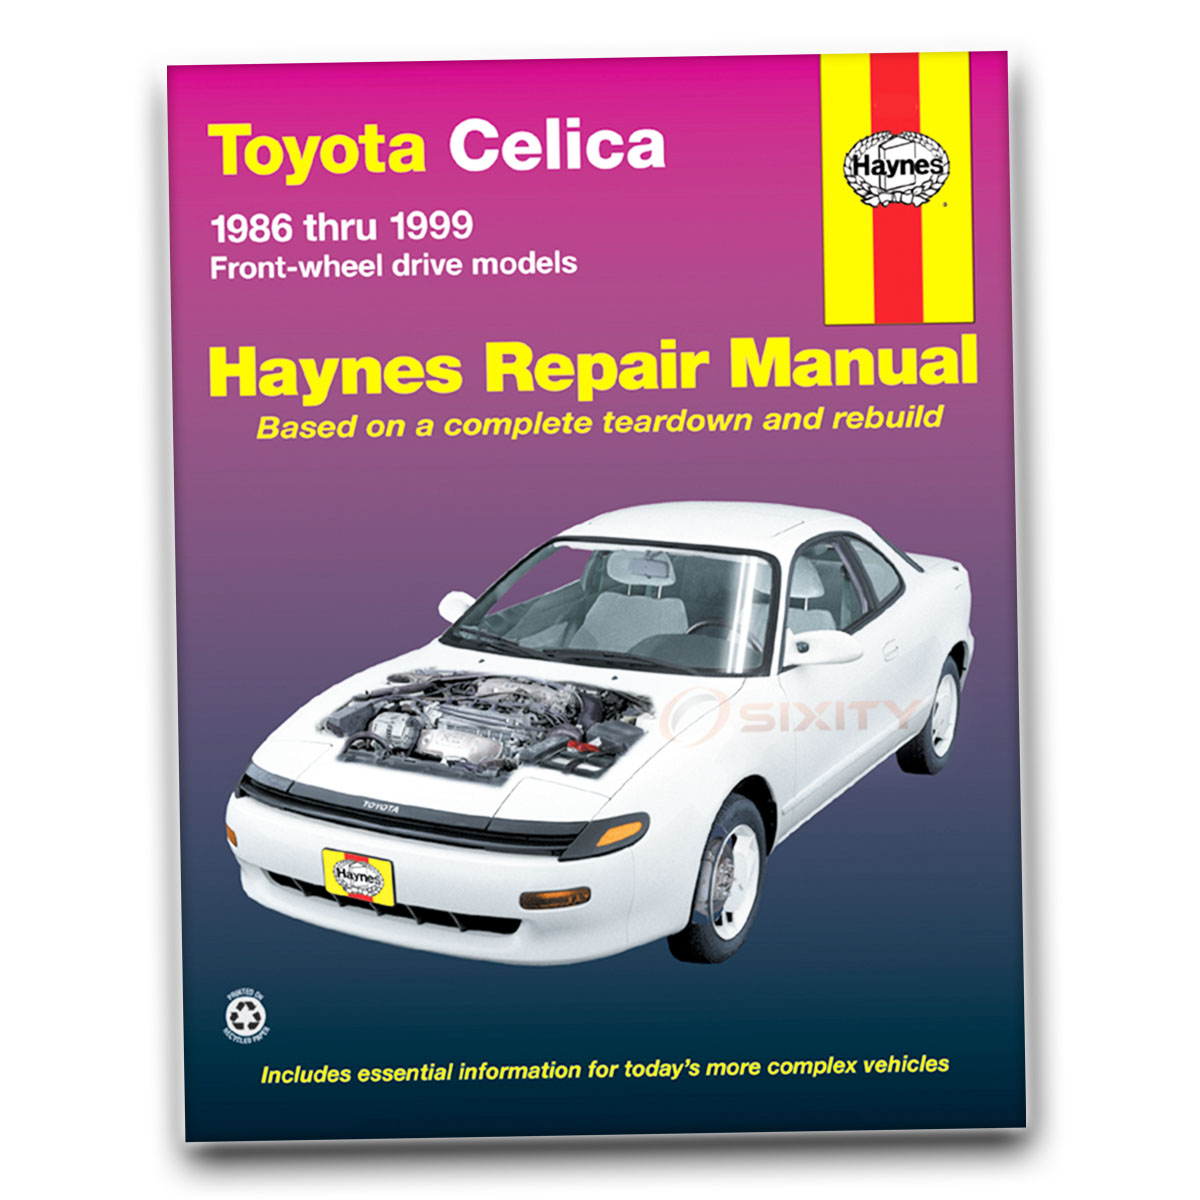 Toyota Celica Haynes Repair Manual All Trac Gts St Shop Service Garage Book Zs